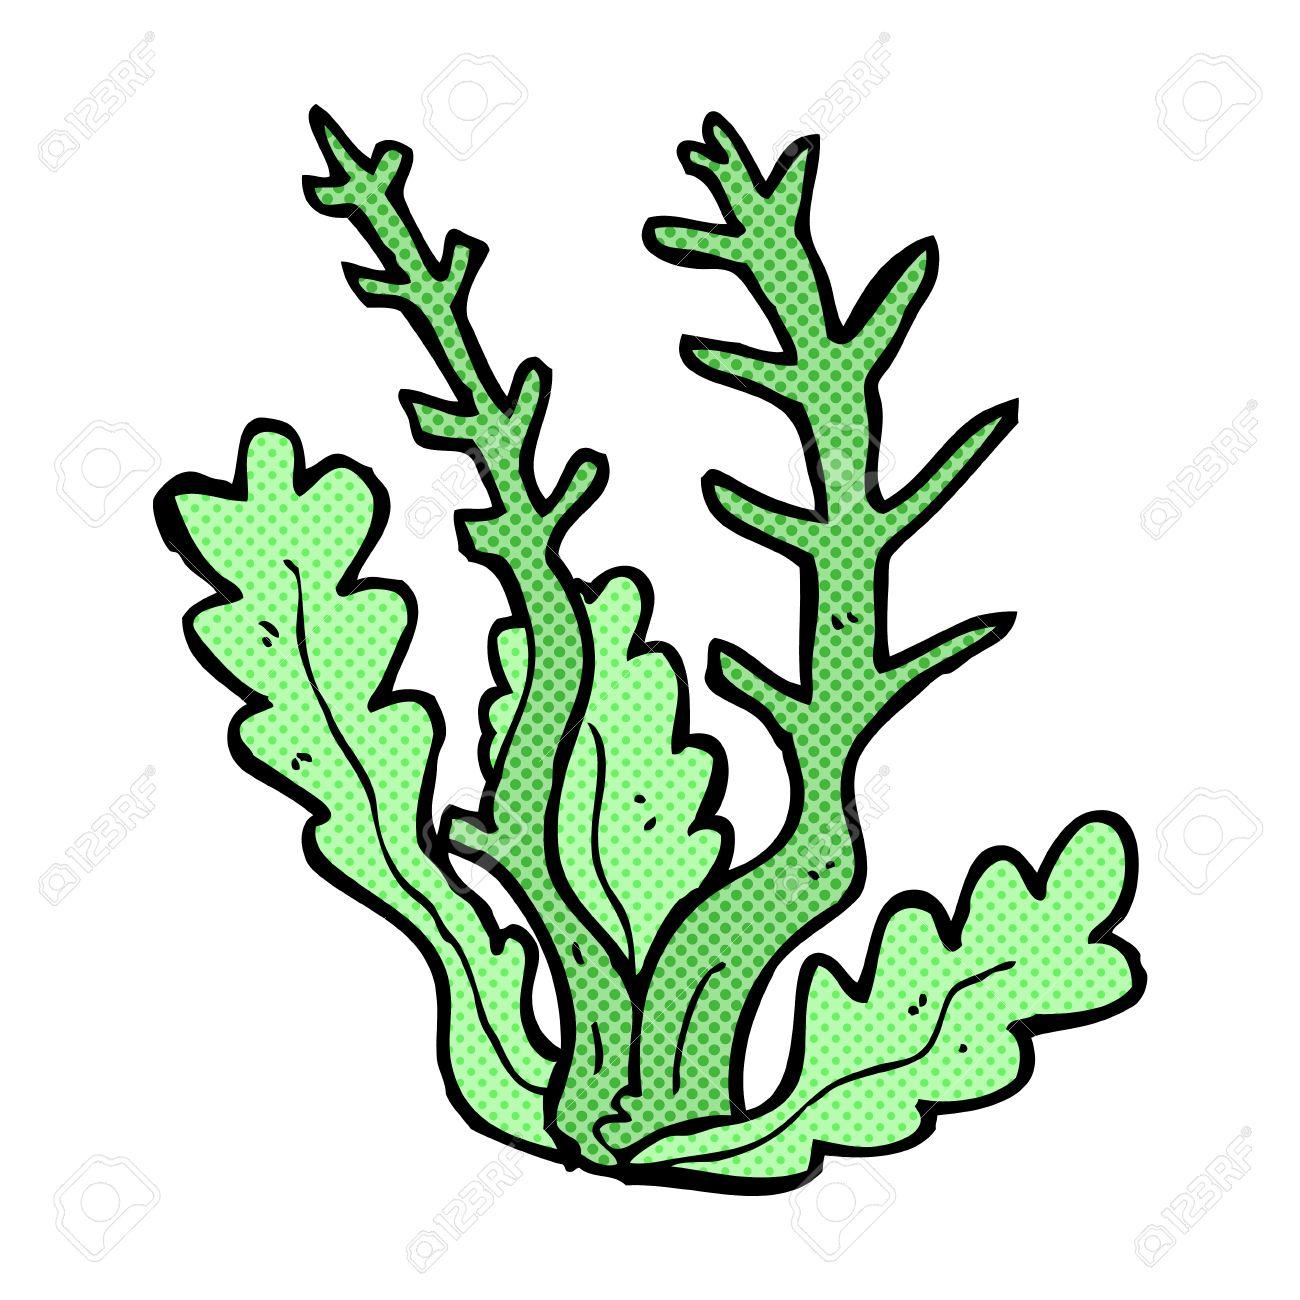 1300x1300 Retro Comic Book Style Cartoon Seaweed Royalty Free Cliparts